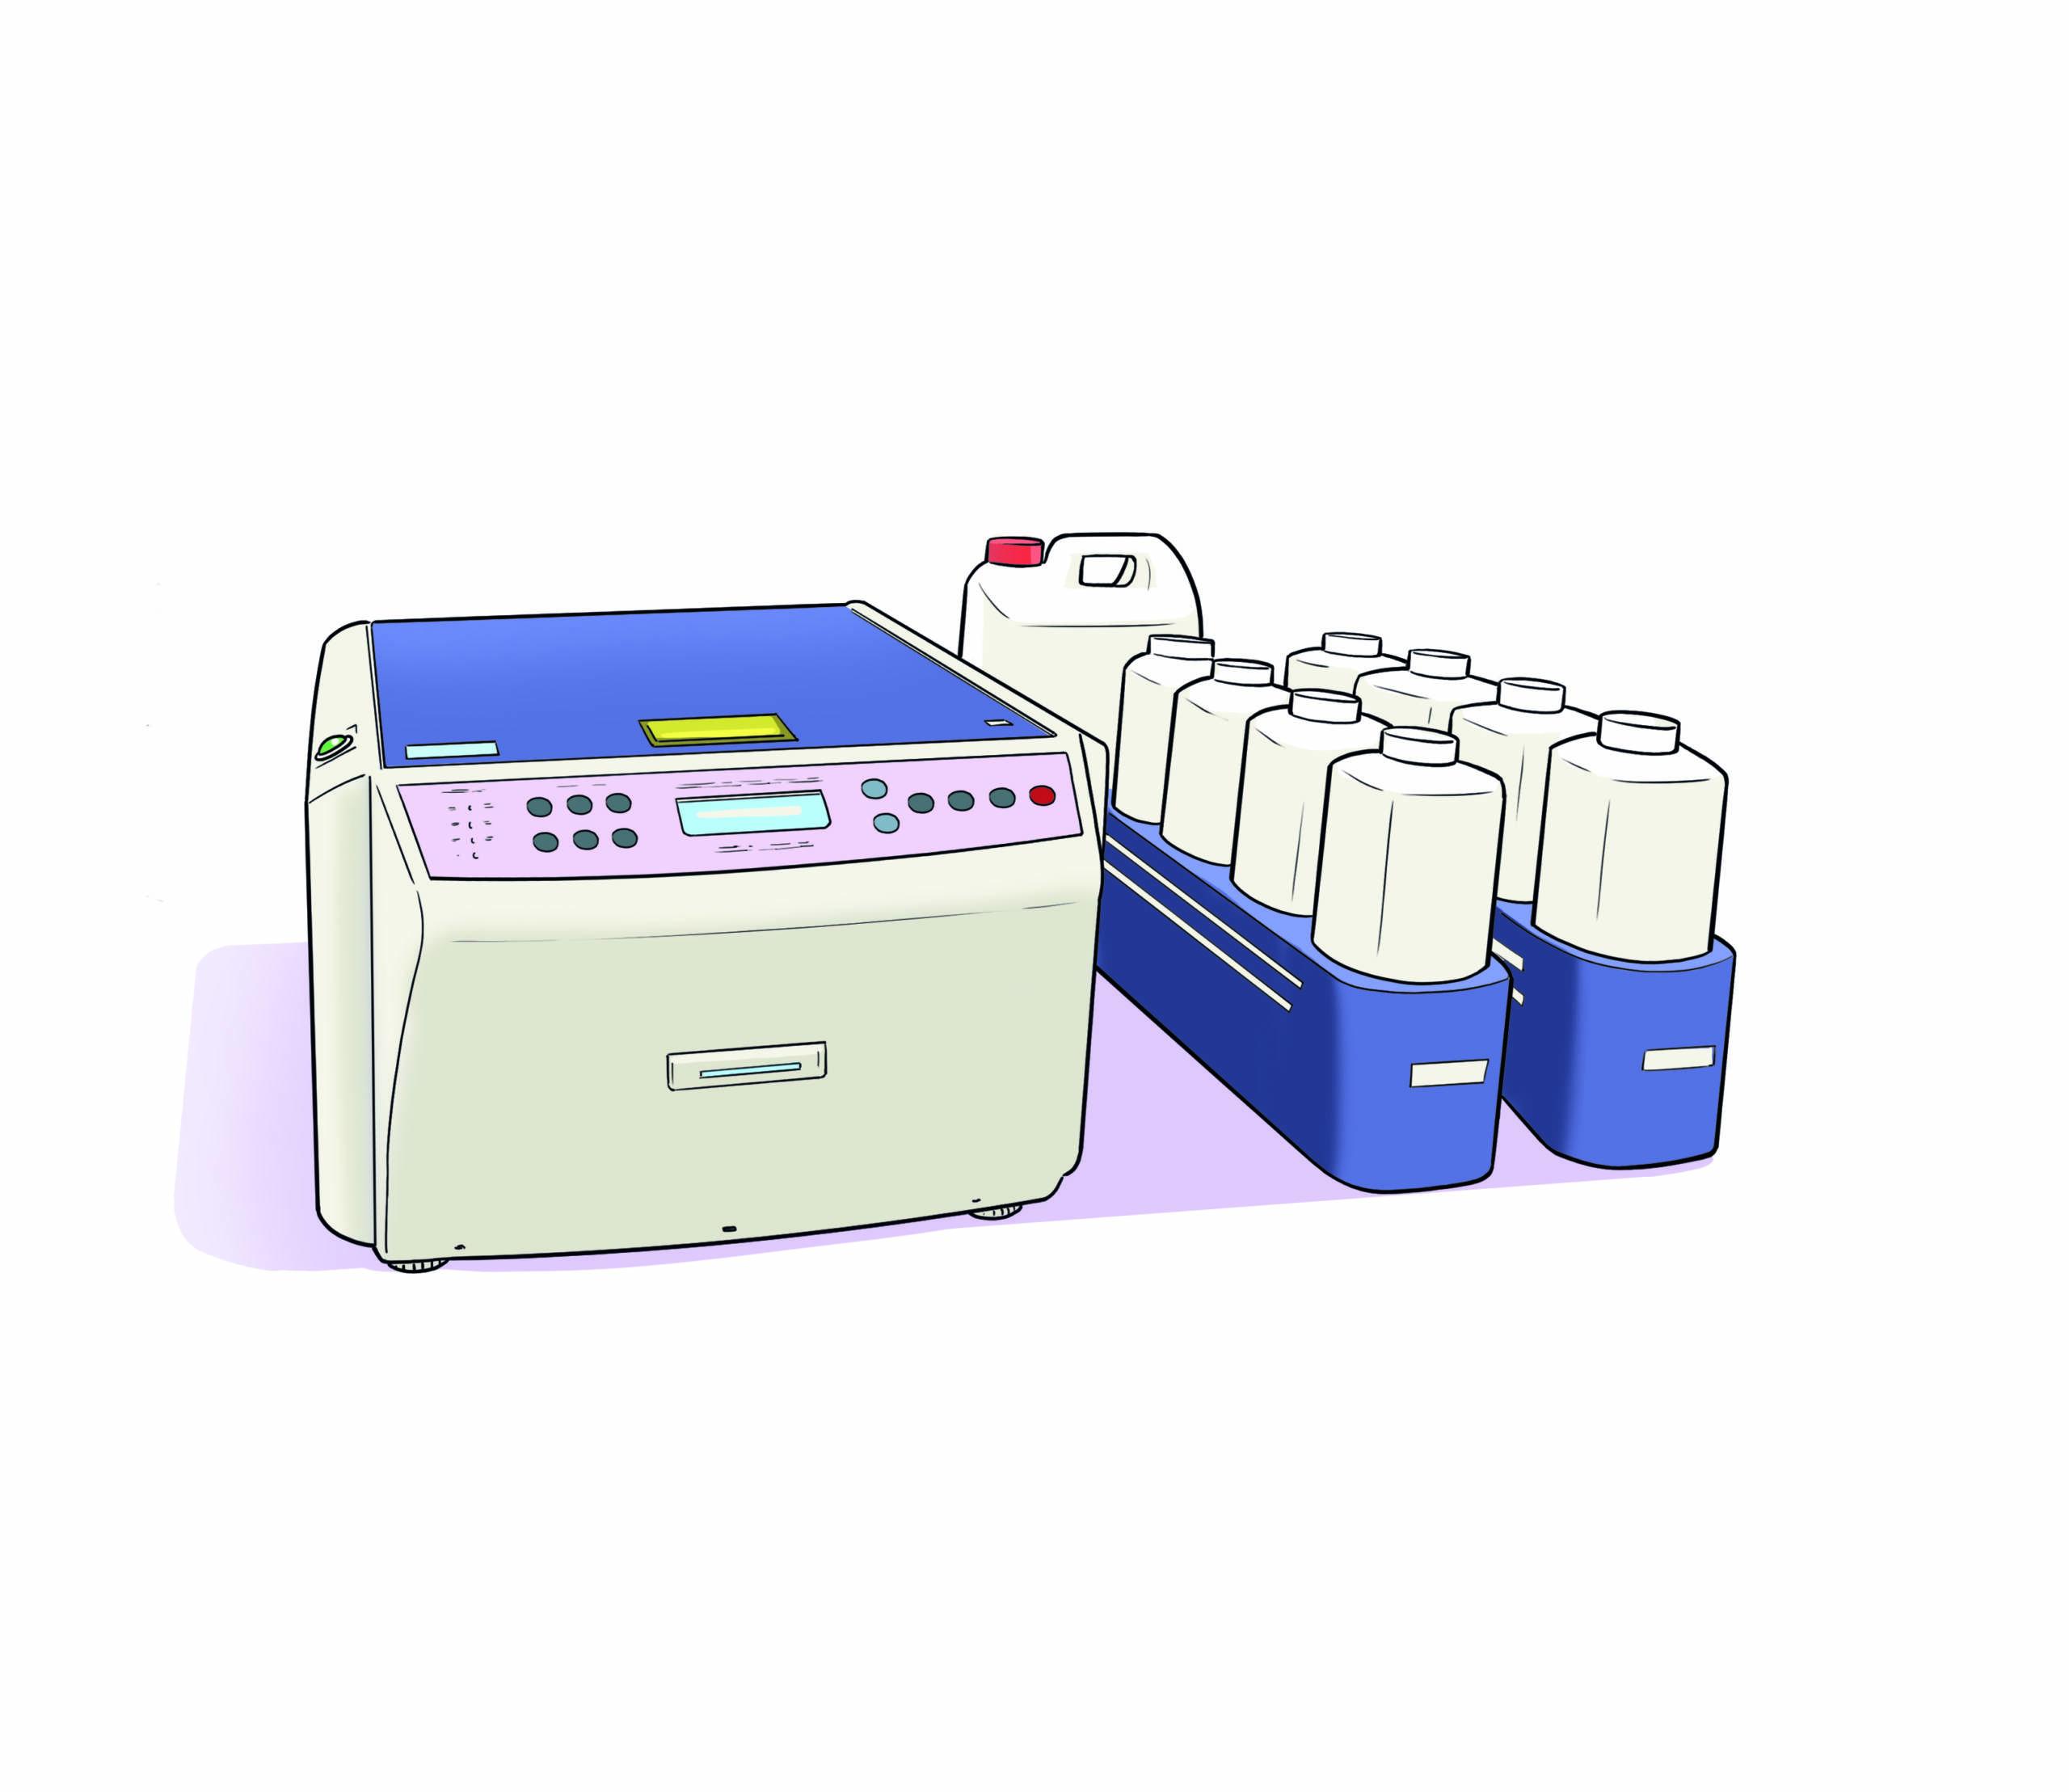 Injektionsfärbegerät